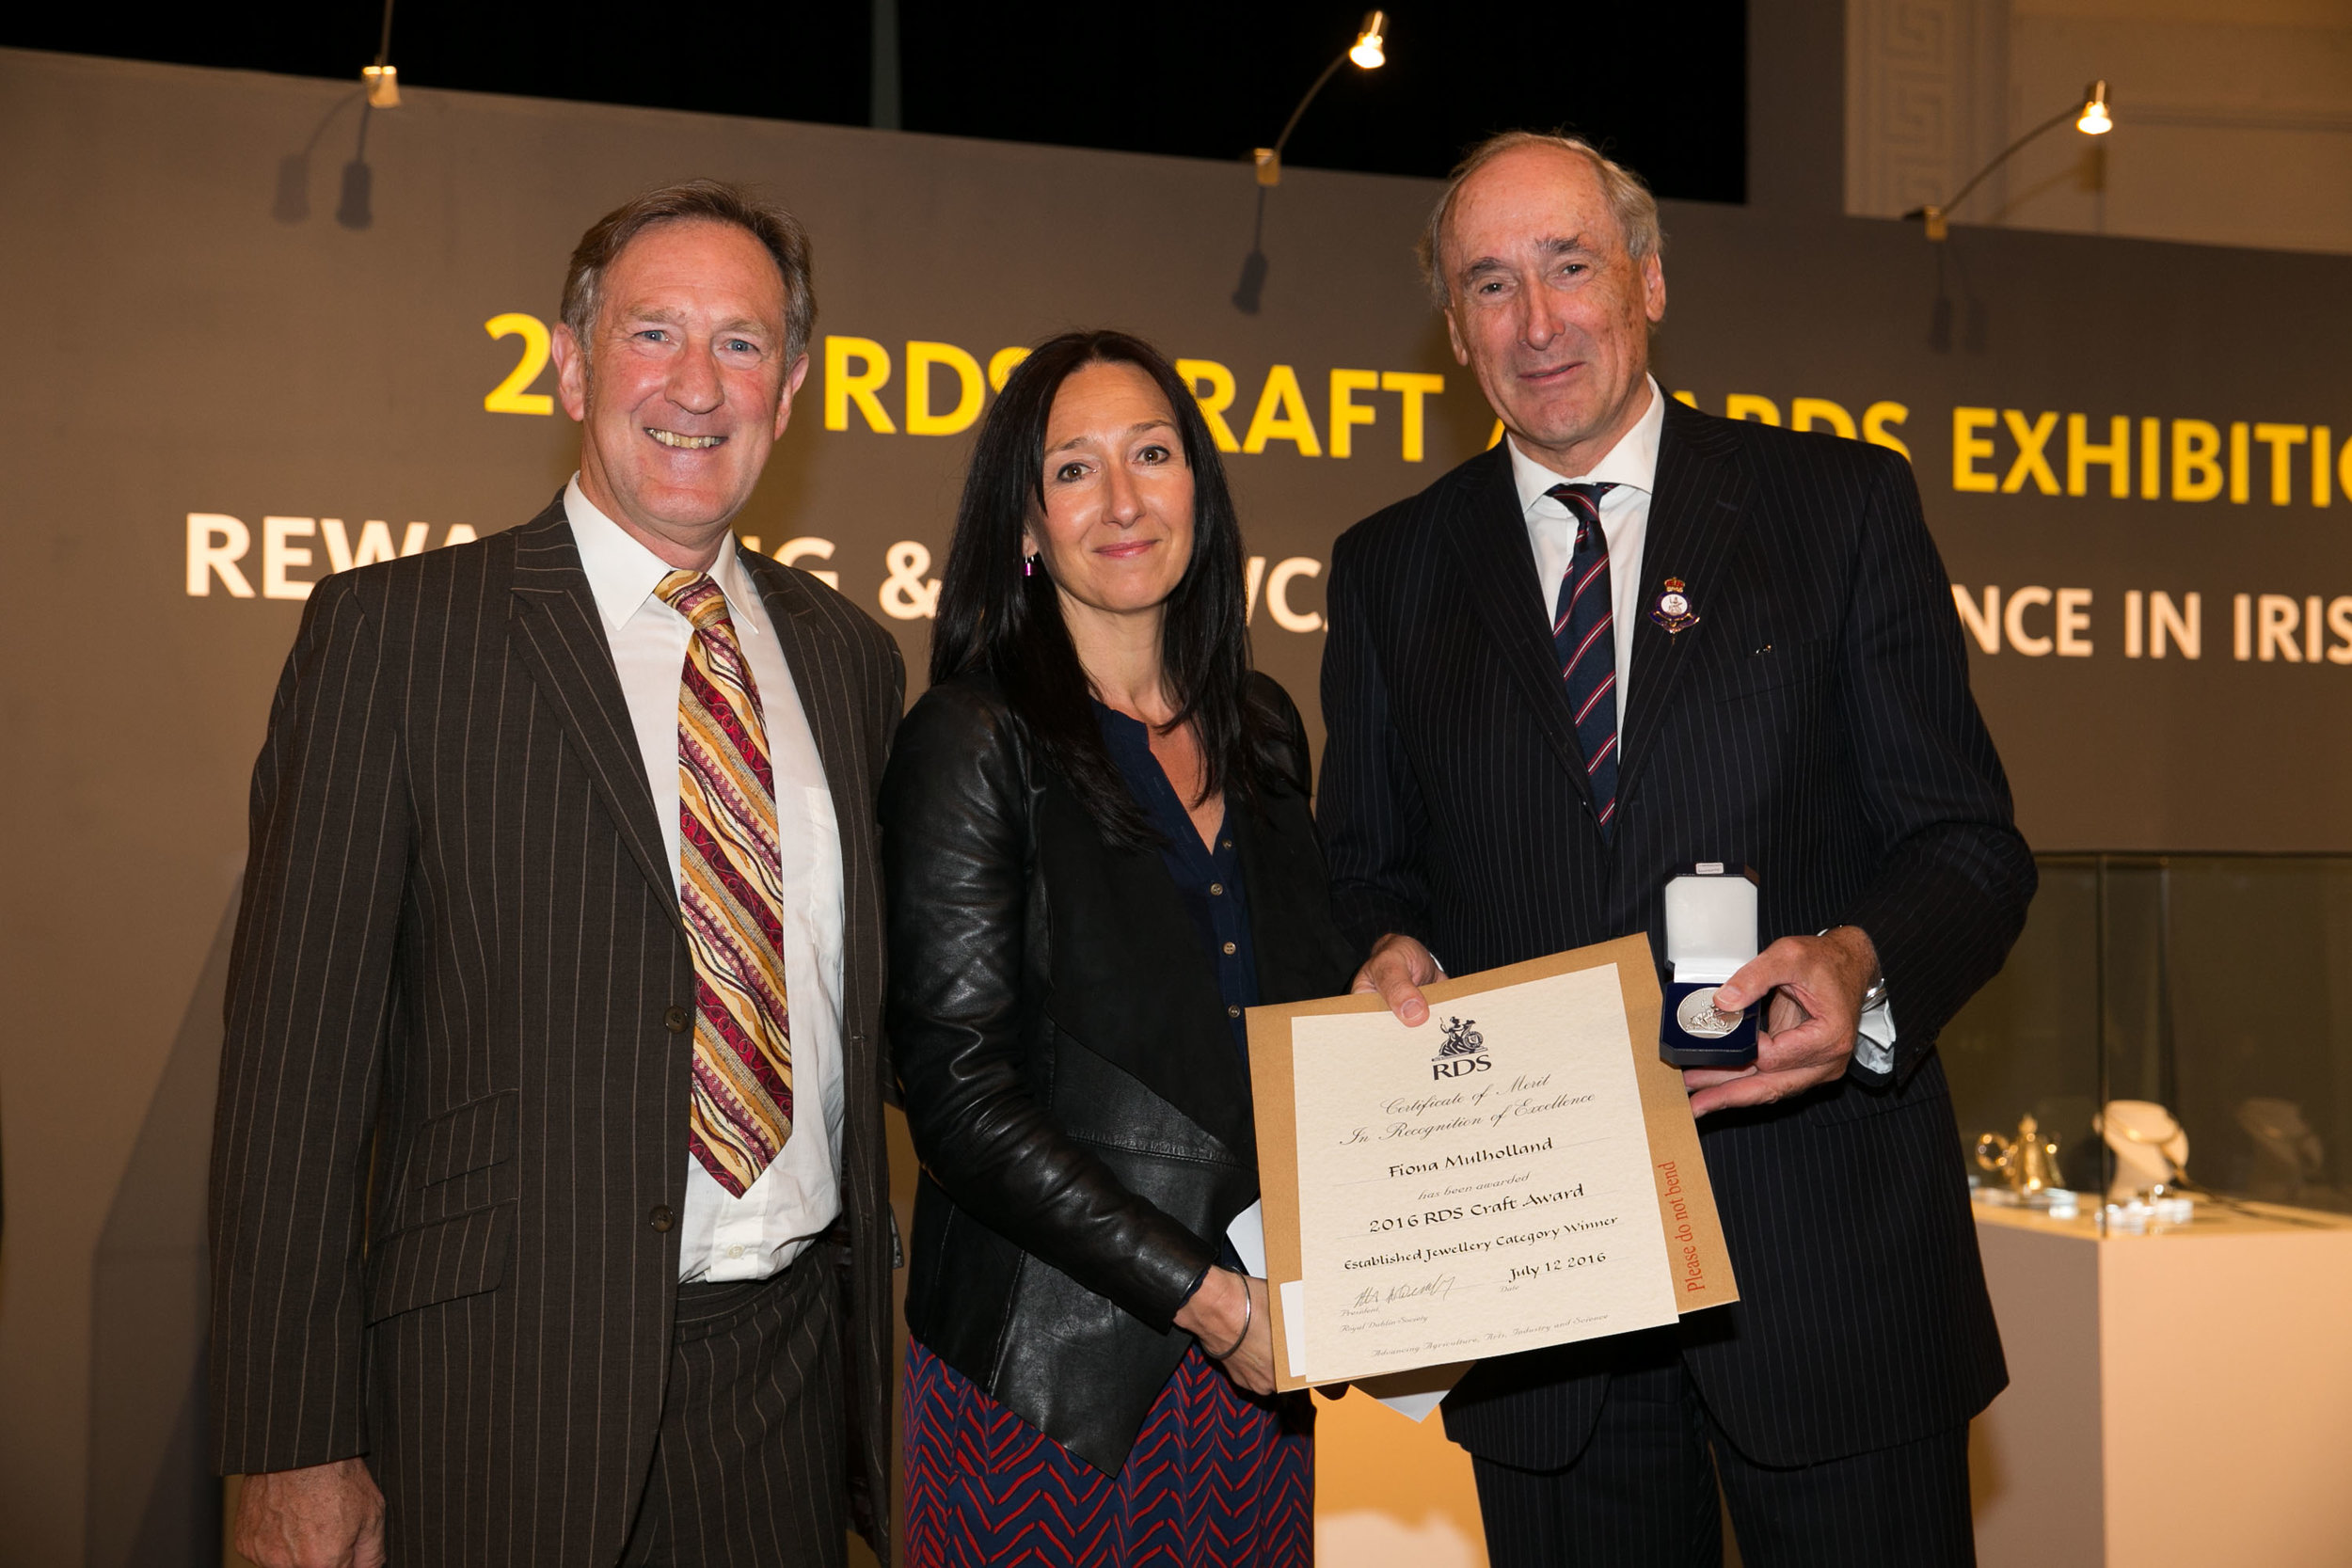 11. Fiona Mulholland. 2016 Jewellery RDS Crafts Awards..jpg